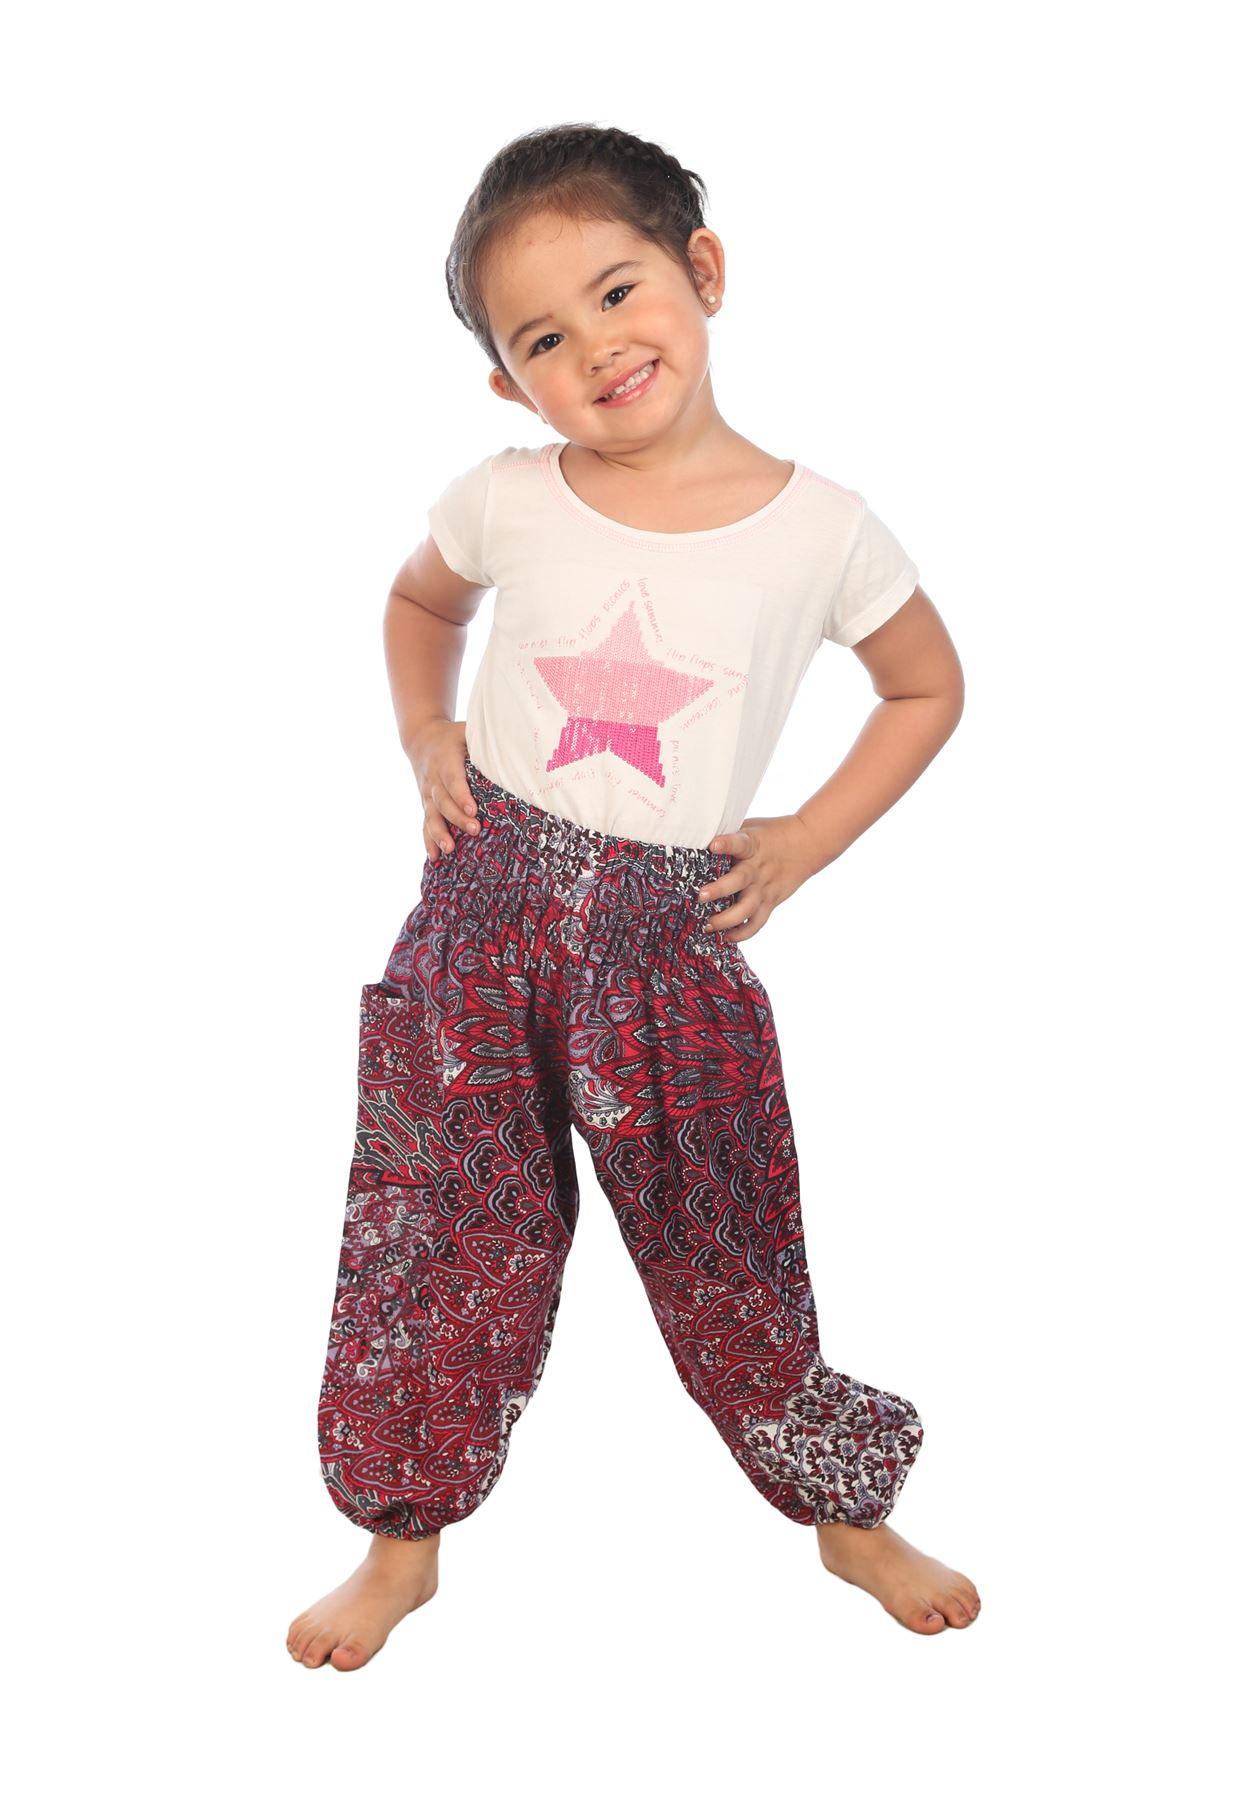 Childrens Harem Trousers Hippie kids clothes Baby Aladdin